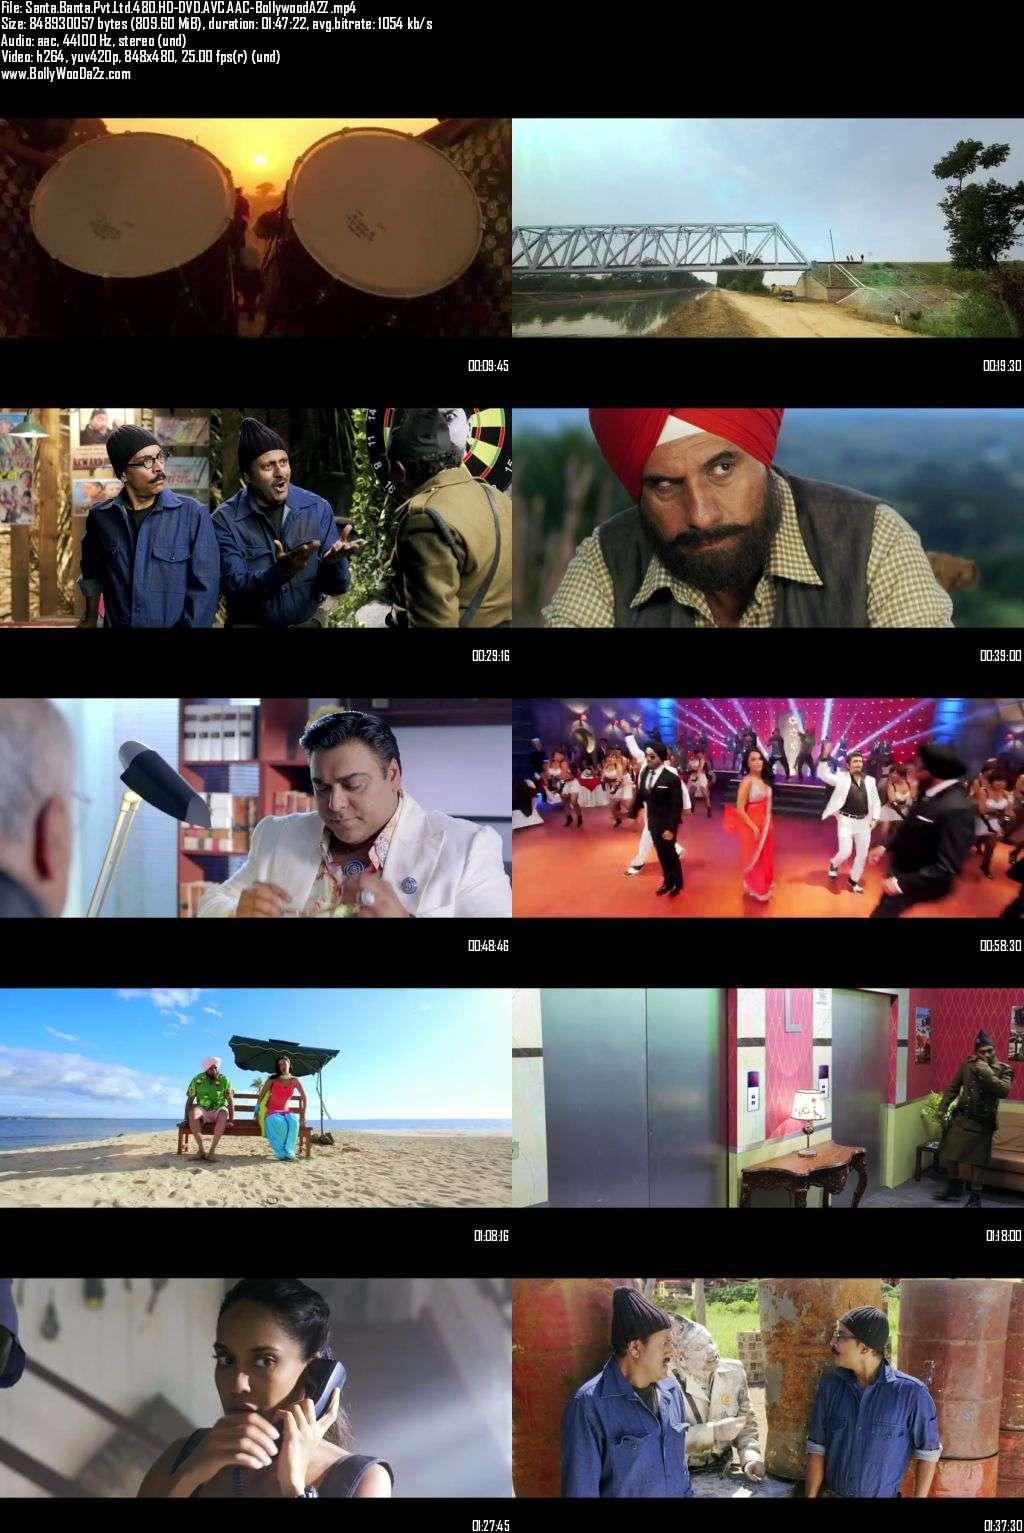 Santa Banta Pvt Ltd (2016) 480p - HD-DVDRip - AVC - AAC-Bollywooda2z